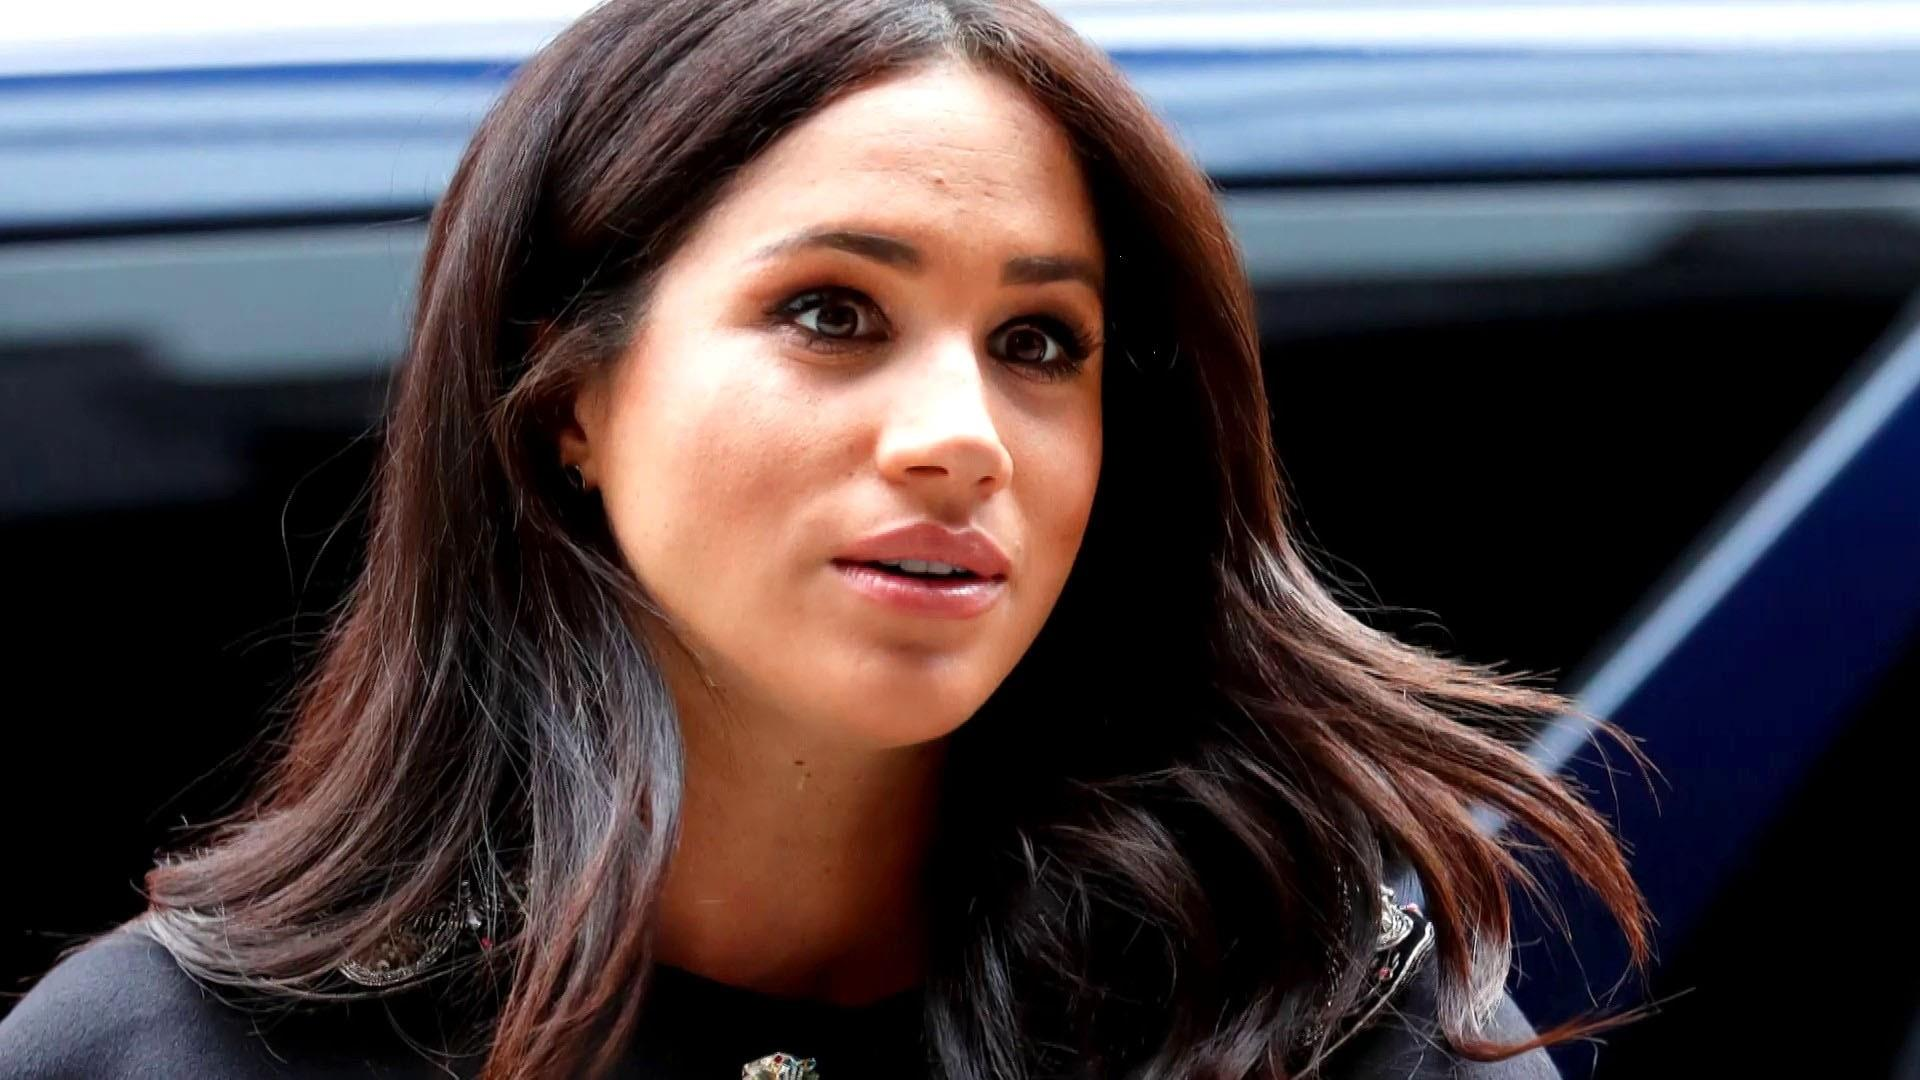 Meghan Markle accuses Buckingham Palace of 'perpetuating falsehoods' against her, Prince Harry